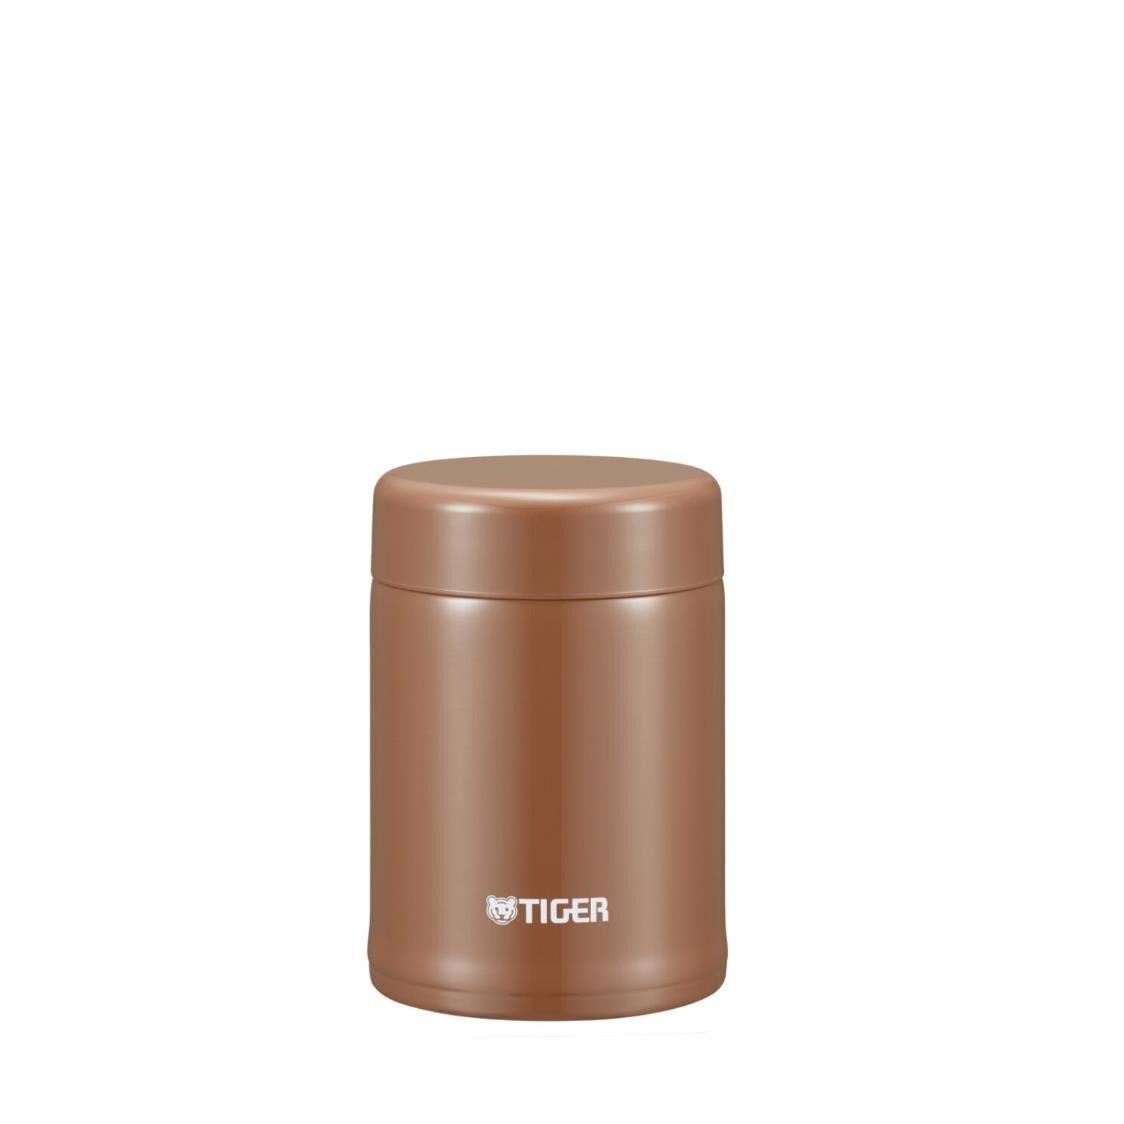 Tiger 250ml Double Stainless Steel Soup Porridge Cup Dark Caramel MCA-C025TC